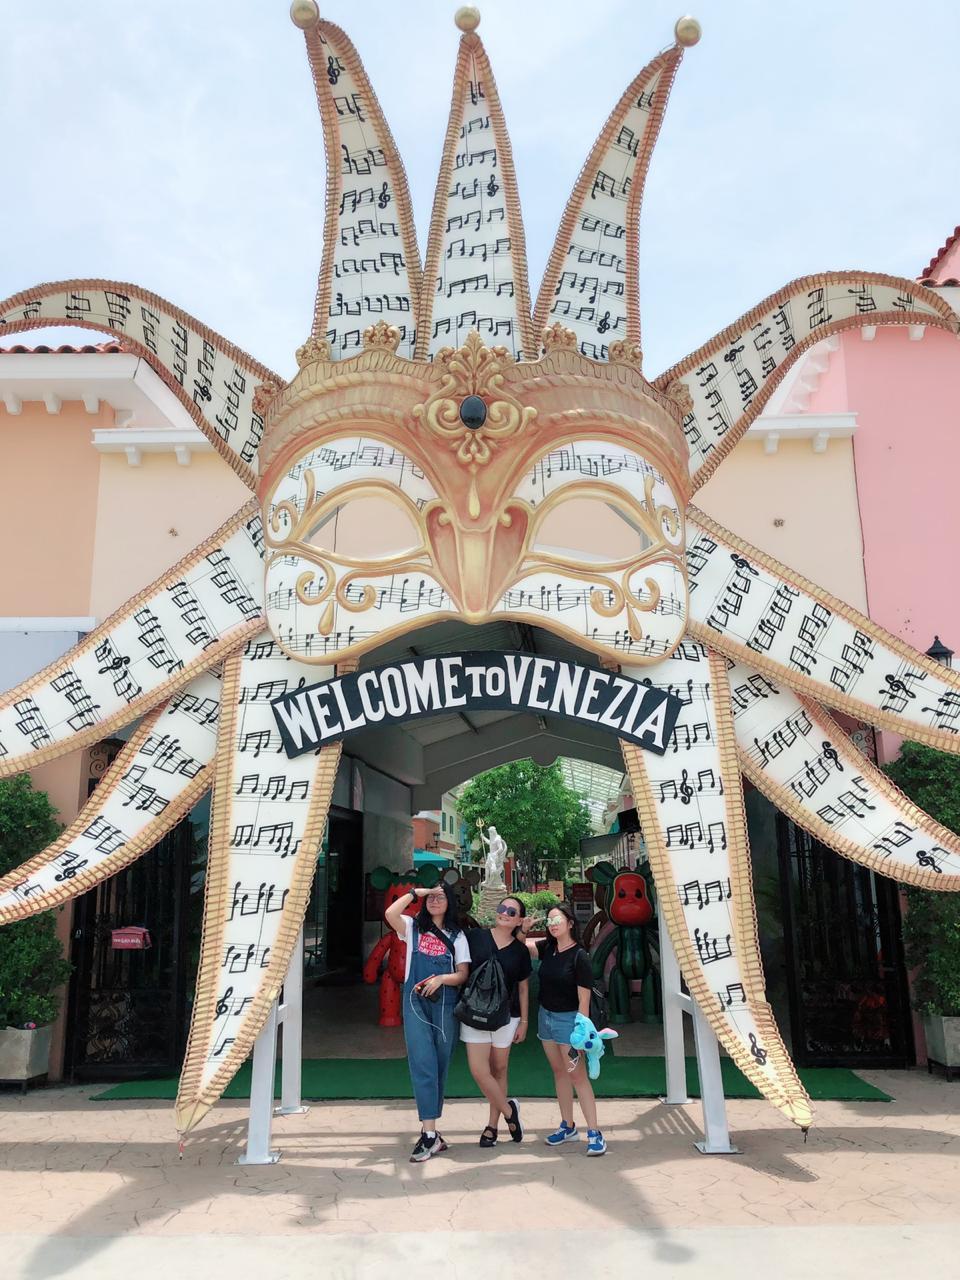 BANGKOK HUAHIN 5D 13 - 17 MEI 2019